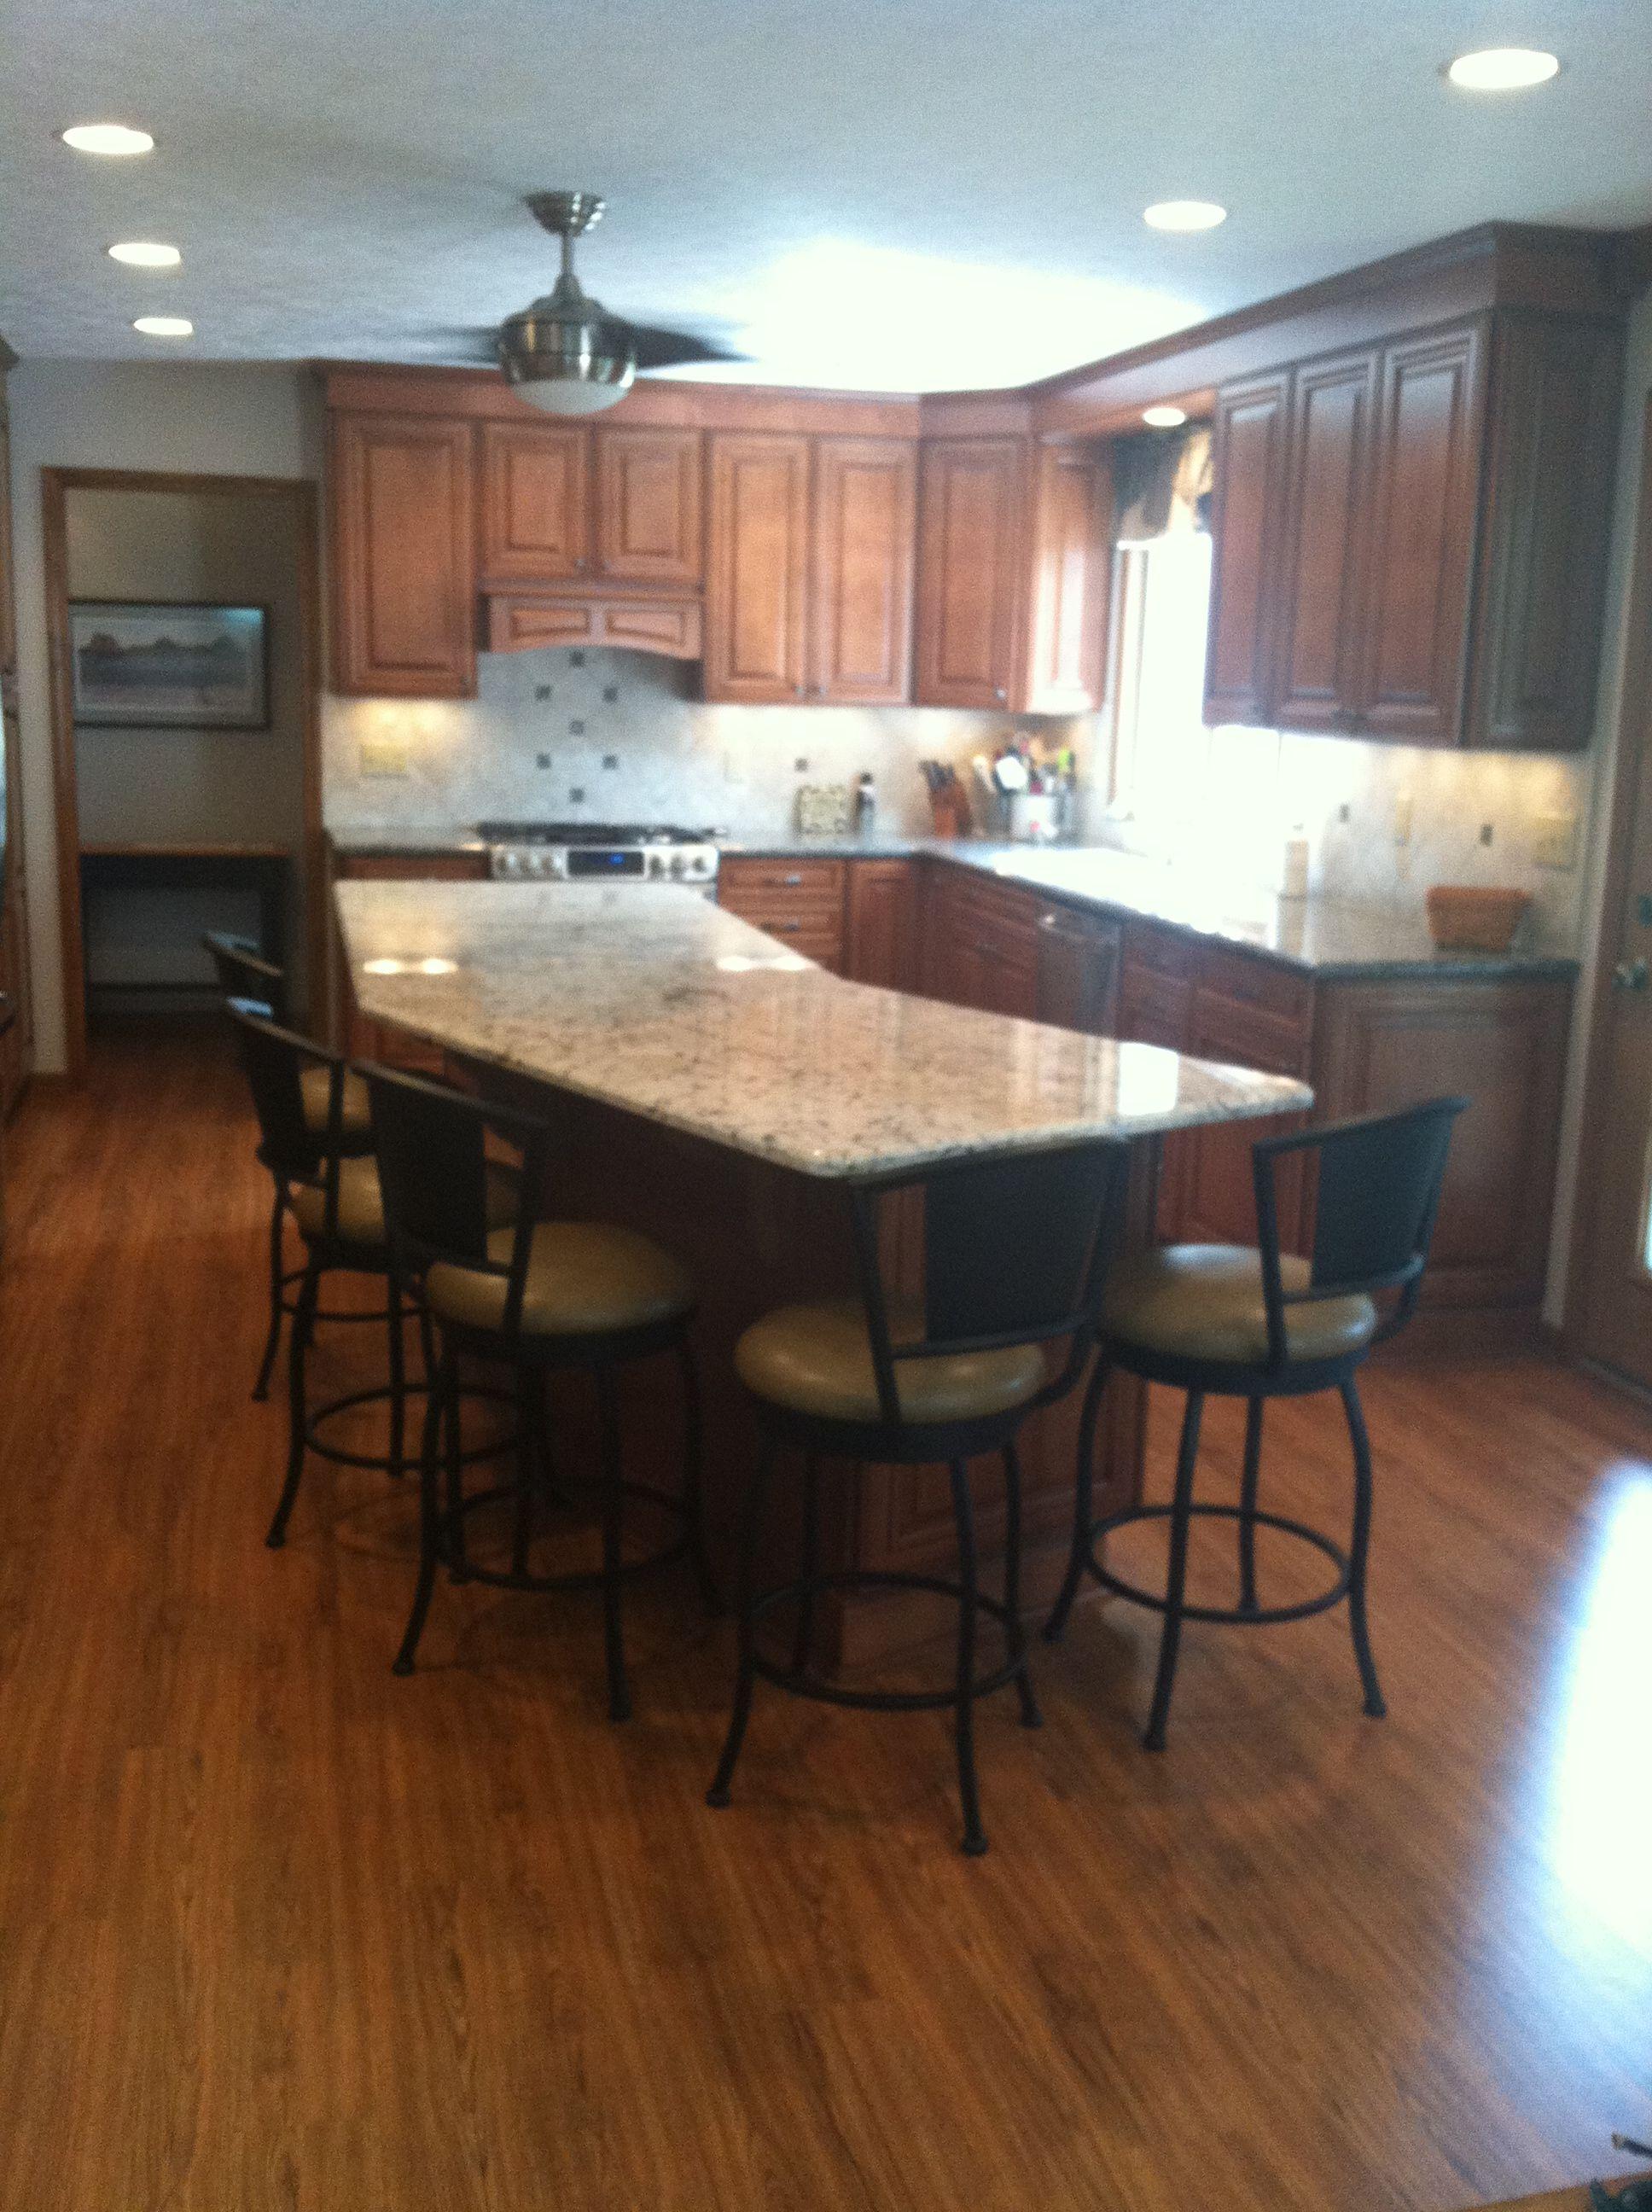 large open kitchen with lvp 6 luxury vinyl plank flooring using new market sweet auburn in 2019 on kitchen remodel vinyl flooring id=26395